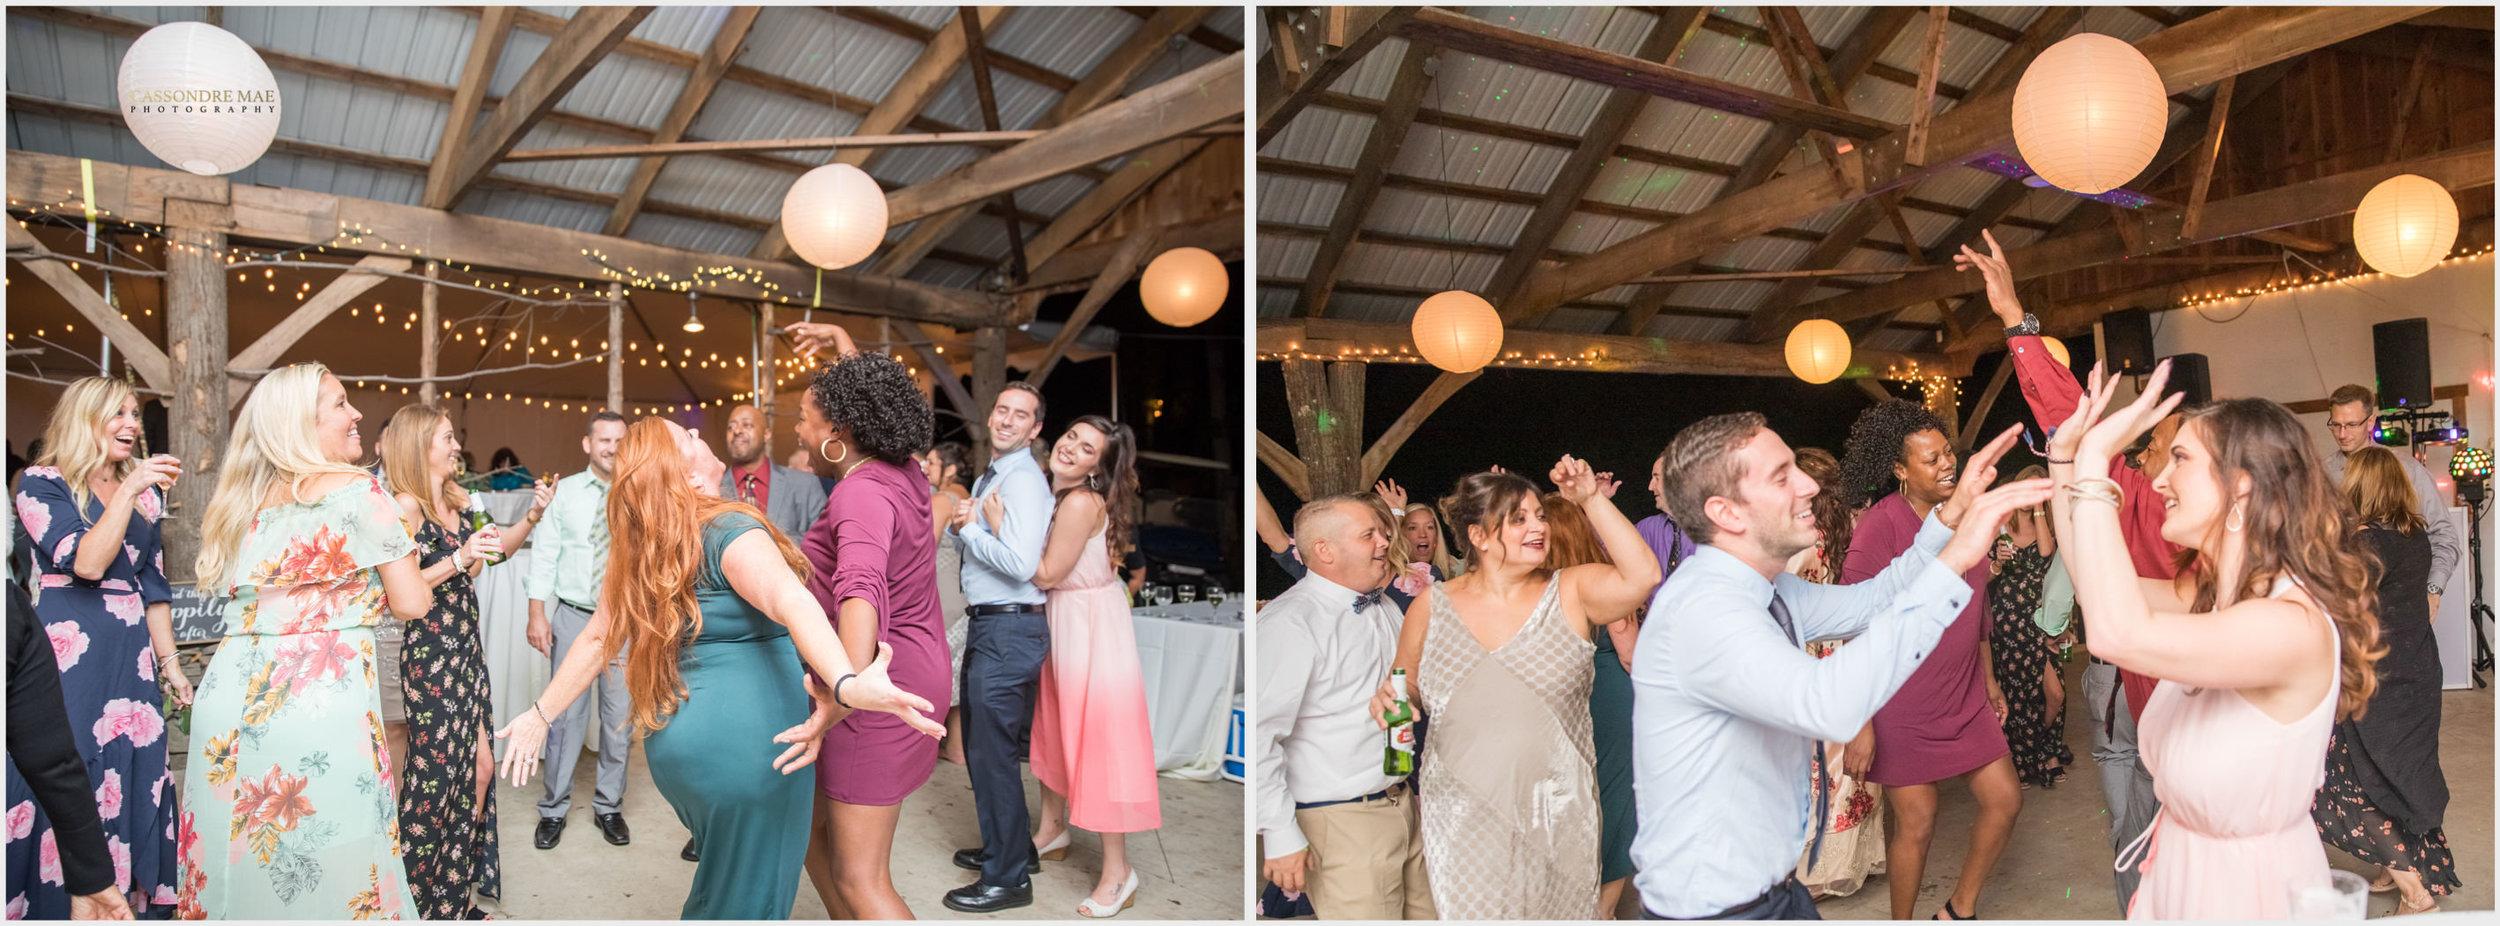 Cassondre Mae Photography Emmerich Tree Farm Wedding 12.jpg